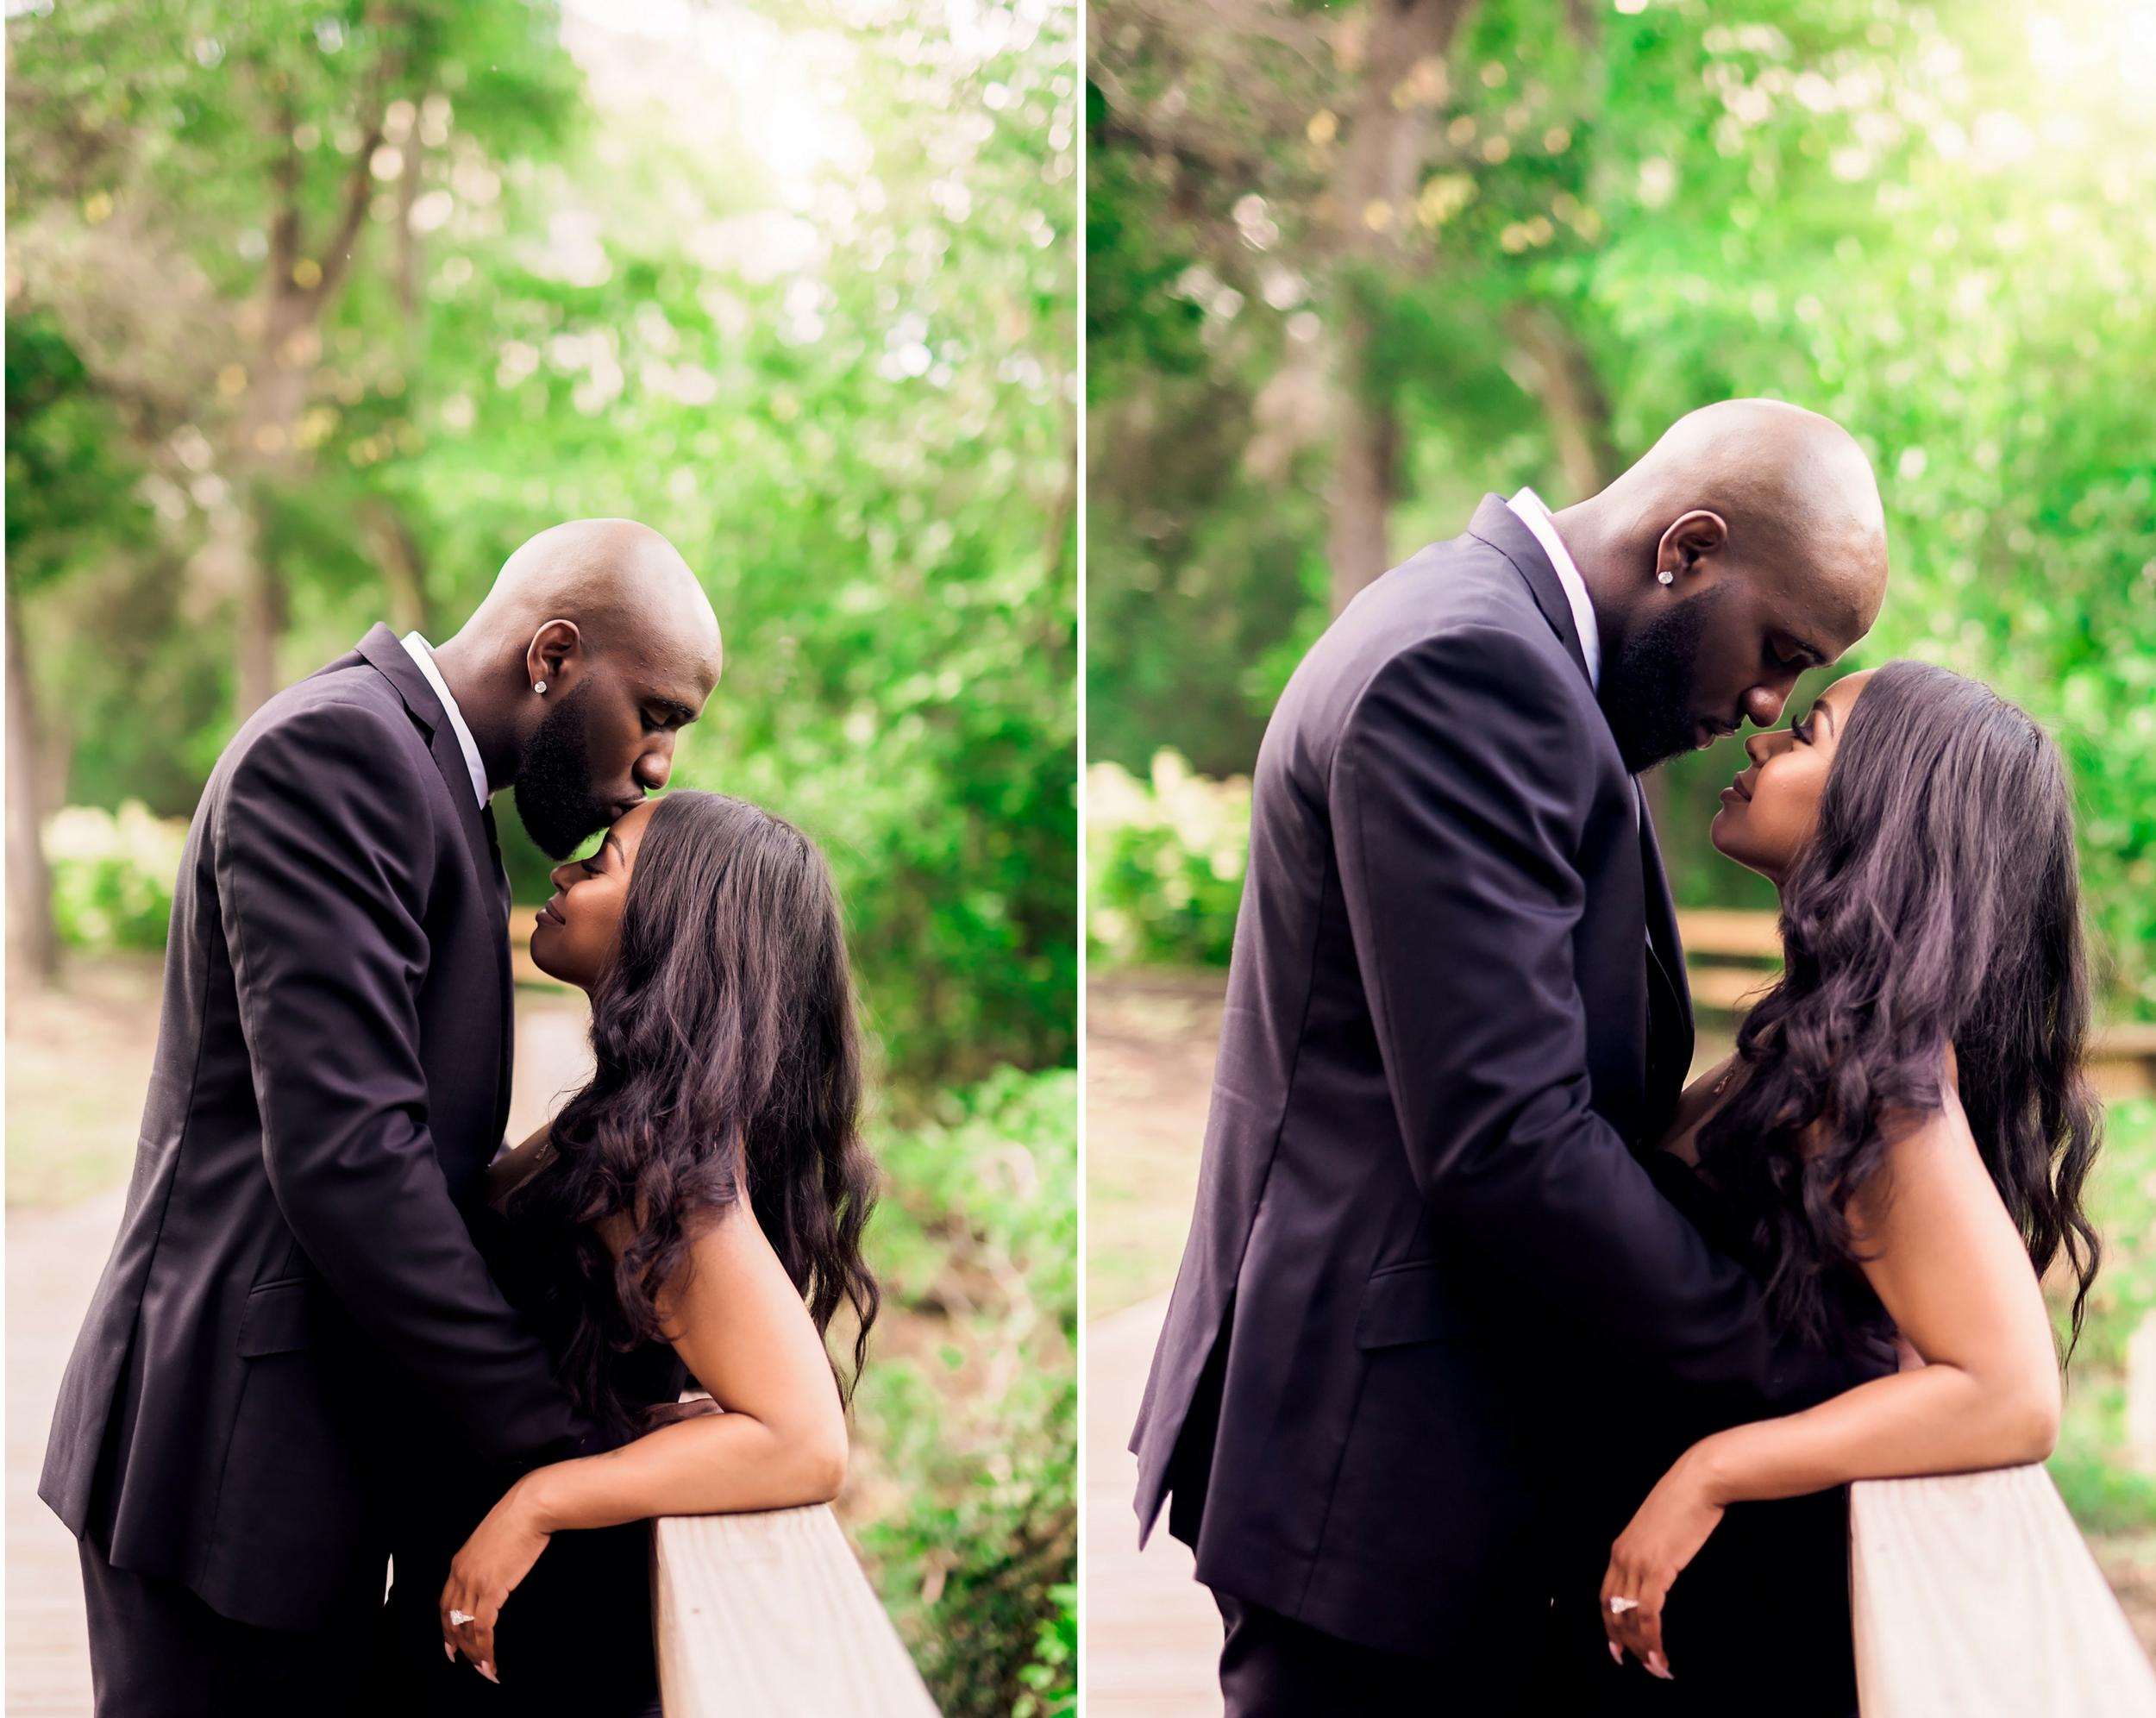 Engagement Shoot- Pharris Photography- Texas Engagement- Texas Photographer- Jessica and Quincy